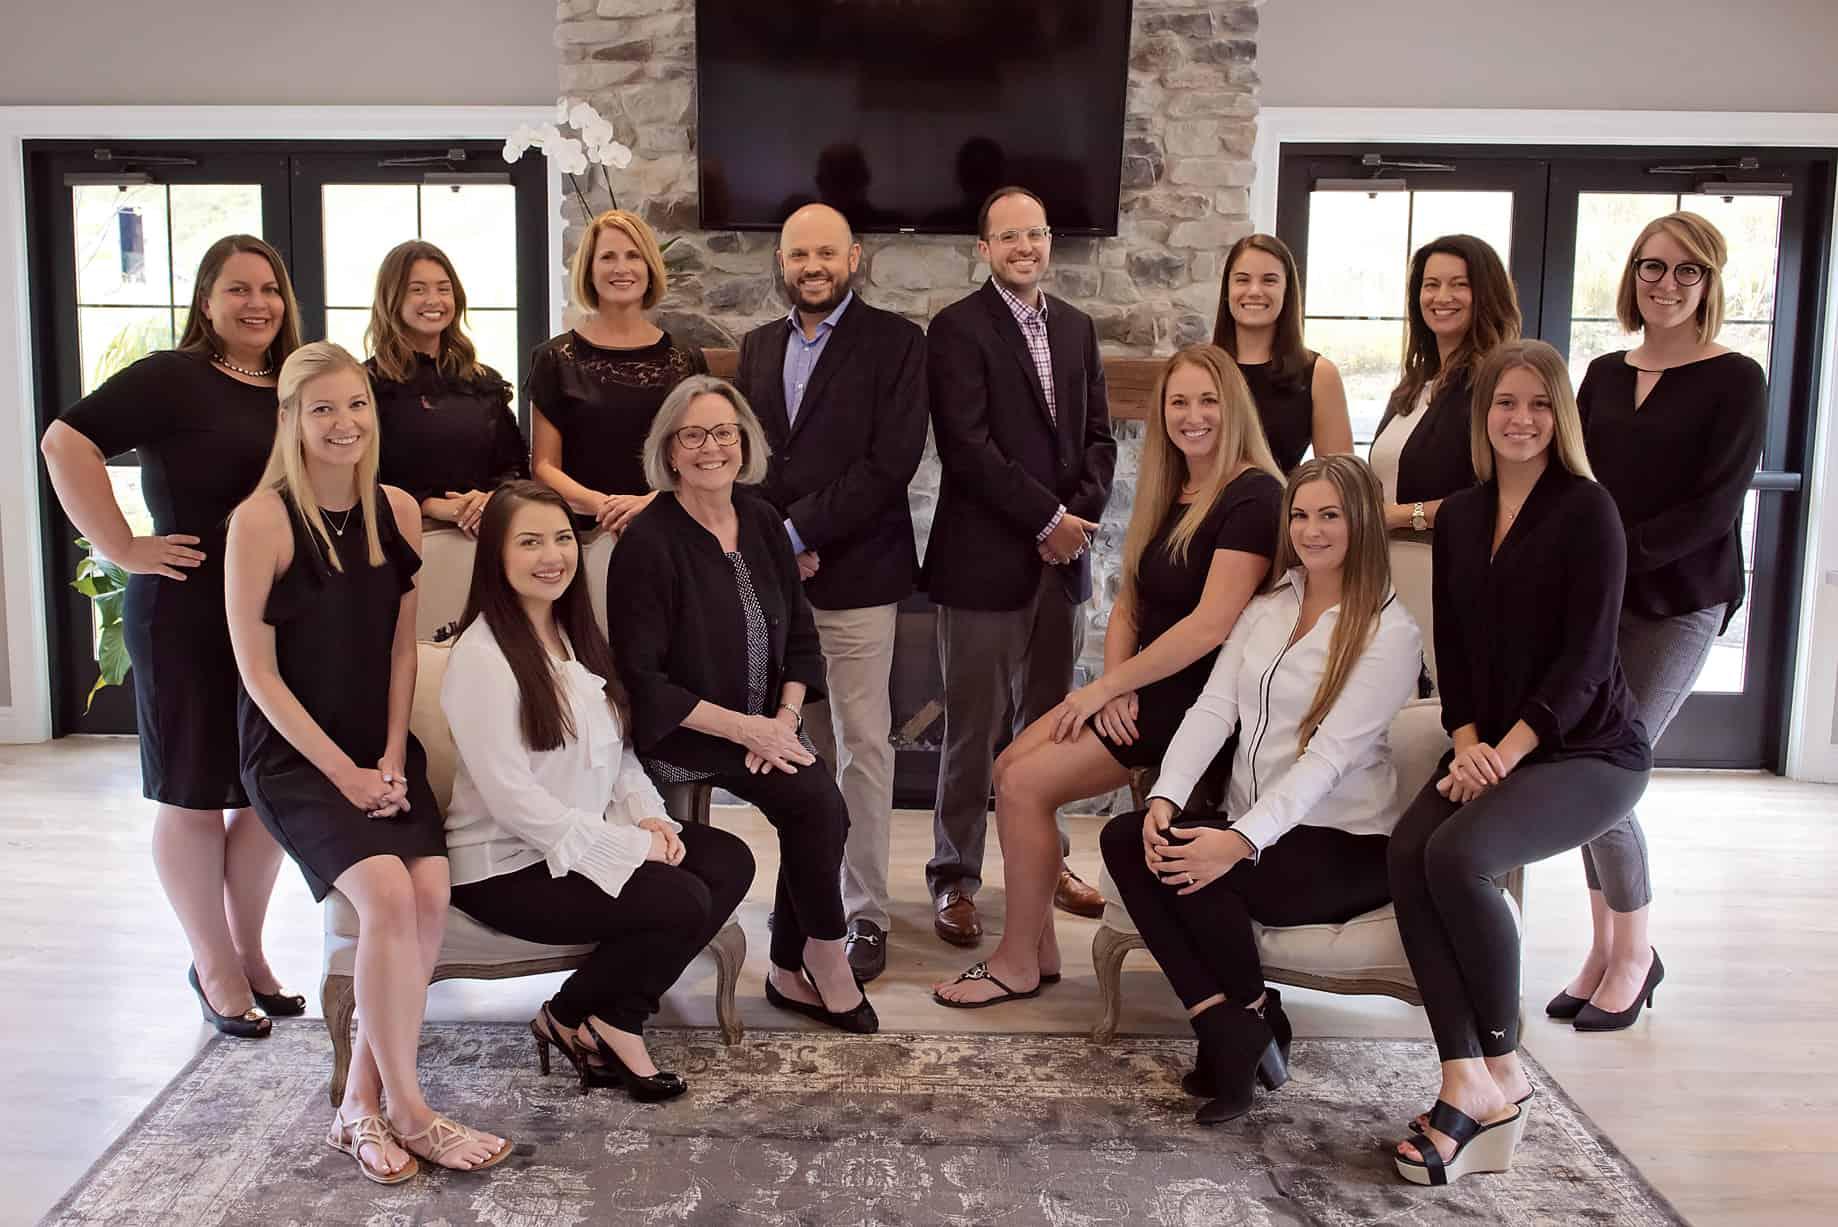 Cranberry Dental Studio | The Team Behind The Reputation